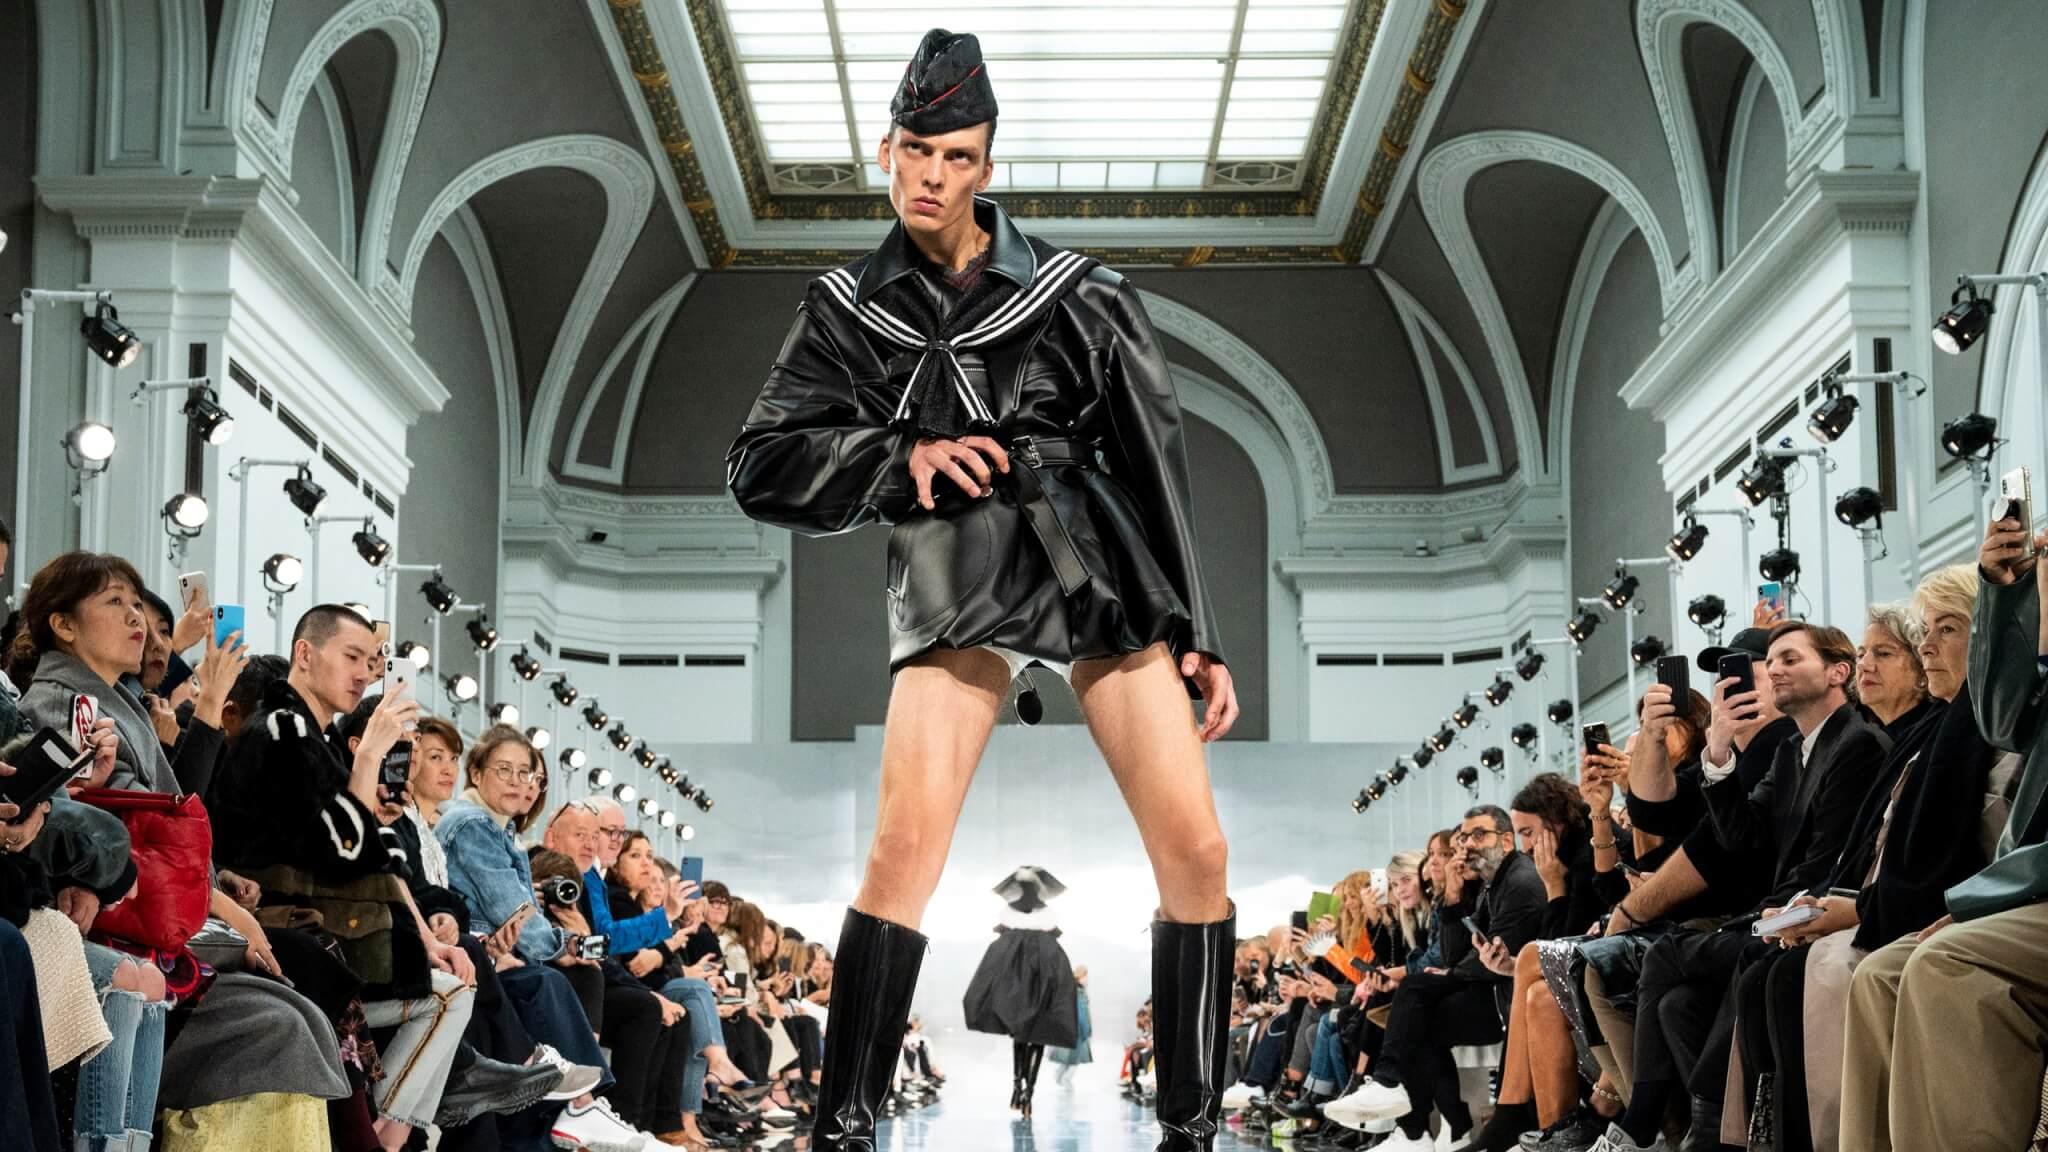 Margiela 2020春夏秀上的模特兒Leon Dame,奇特台步以及被人稱為怒氣沖沖的表情瞬間在巴黎引起話題。